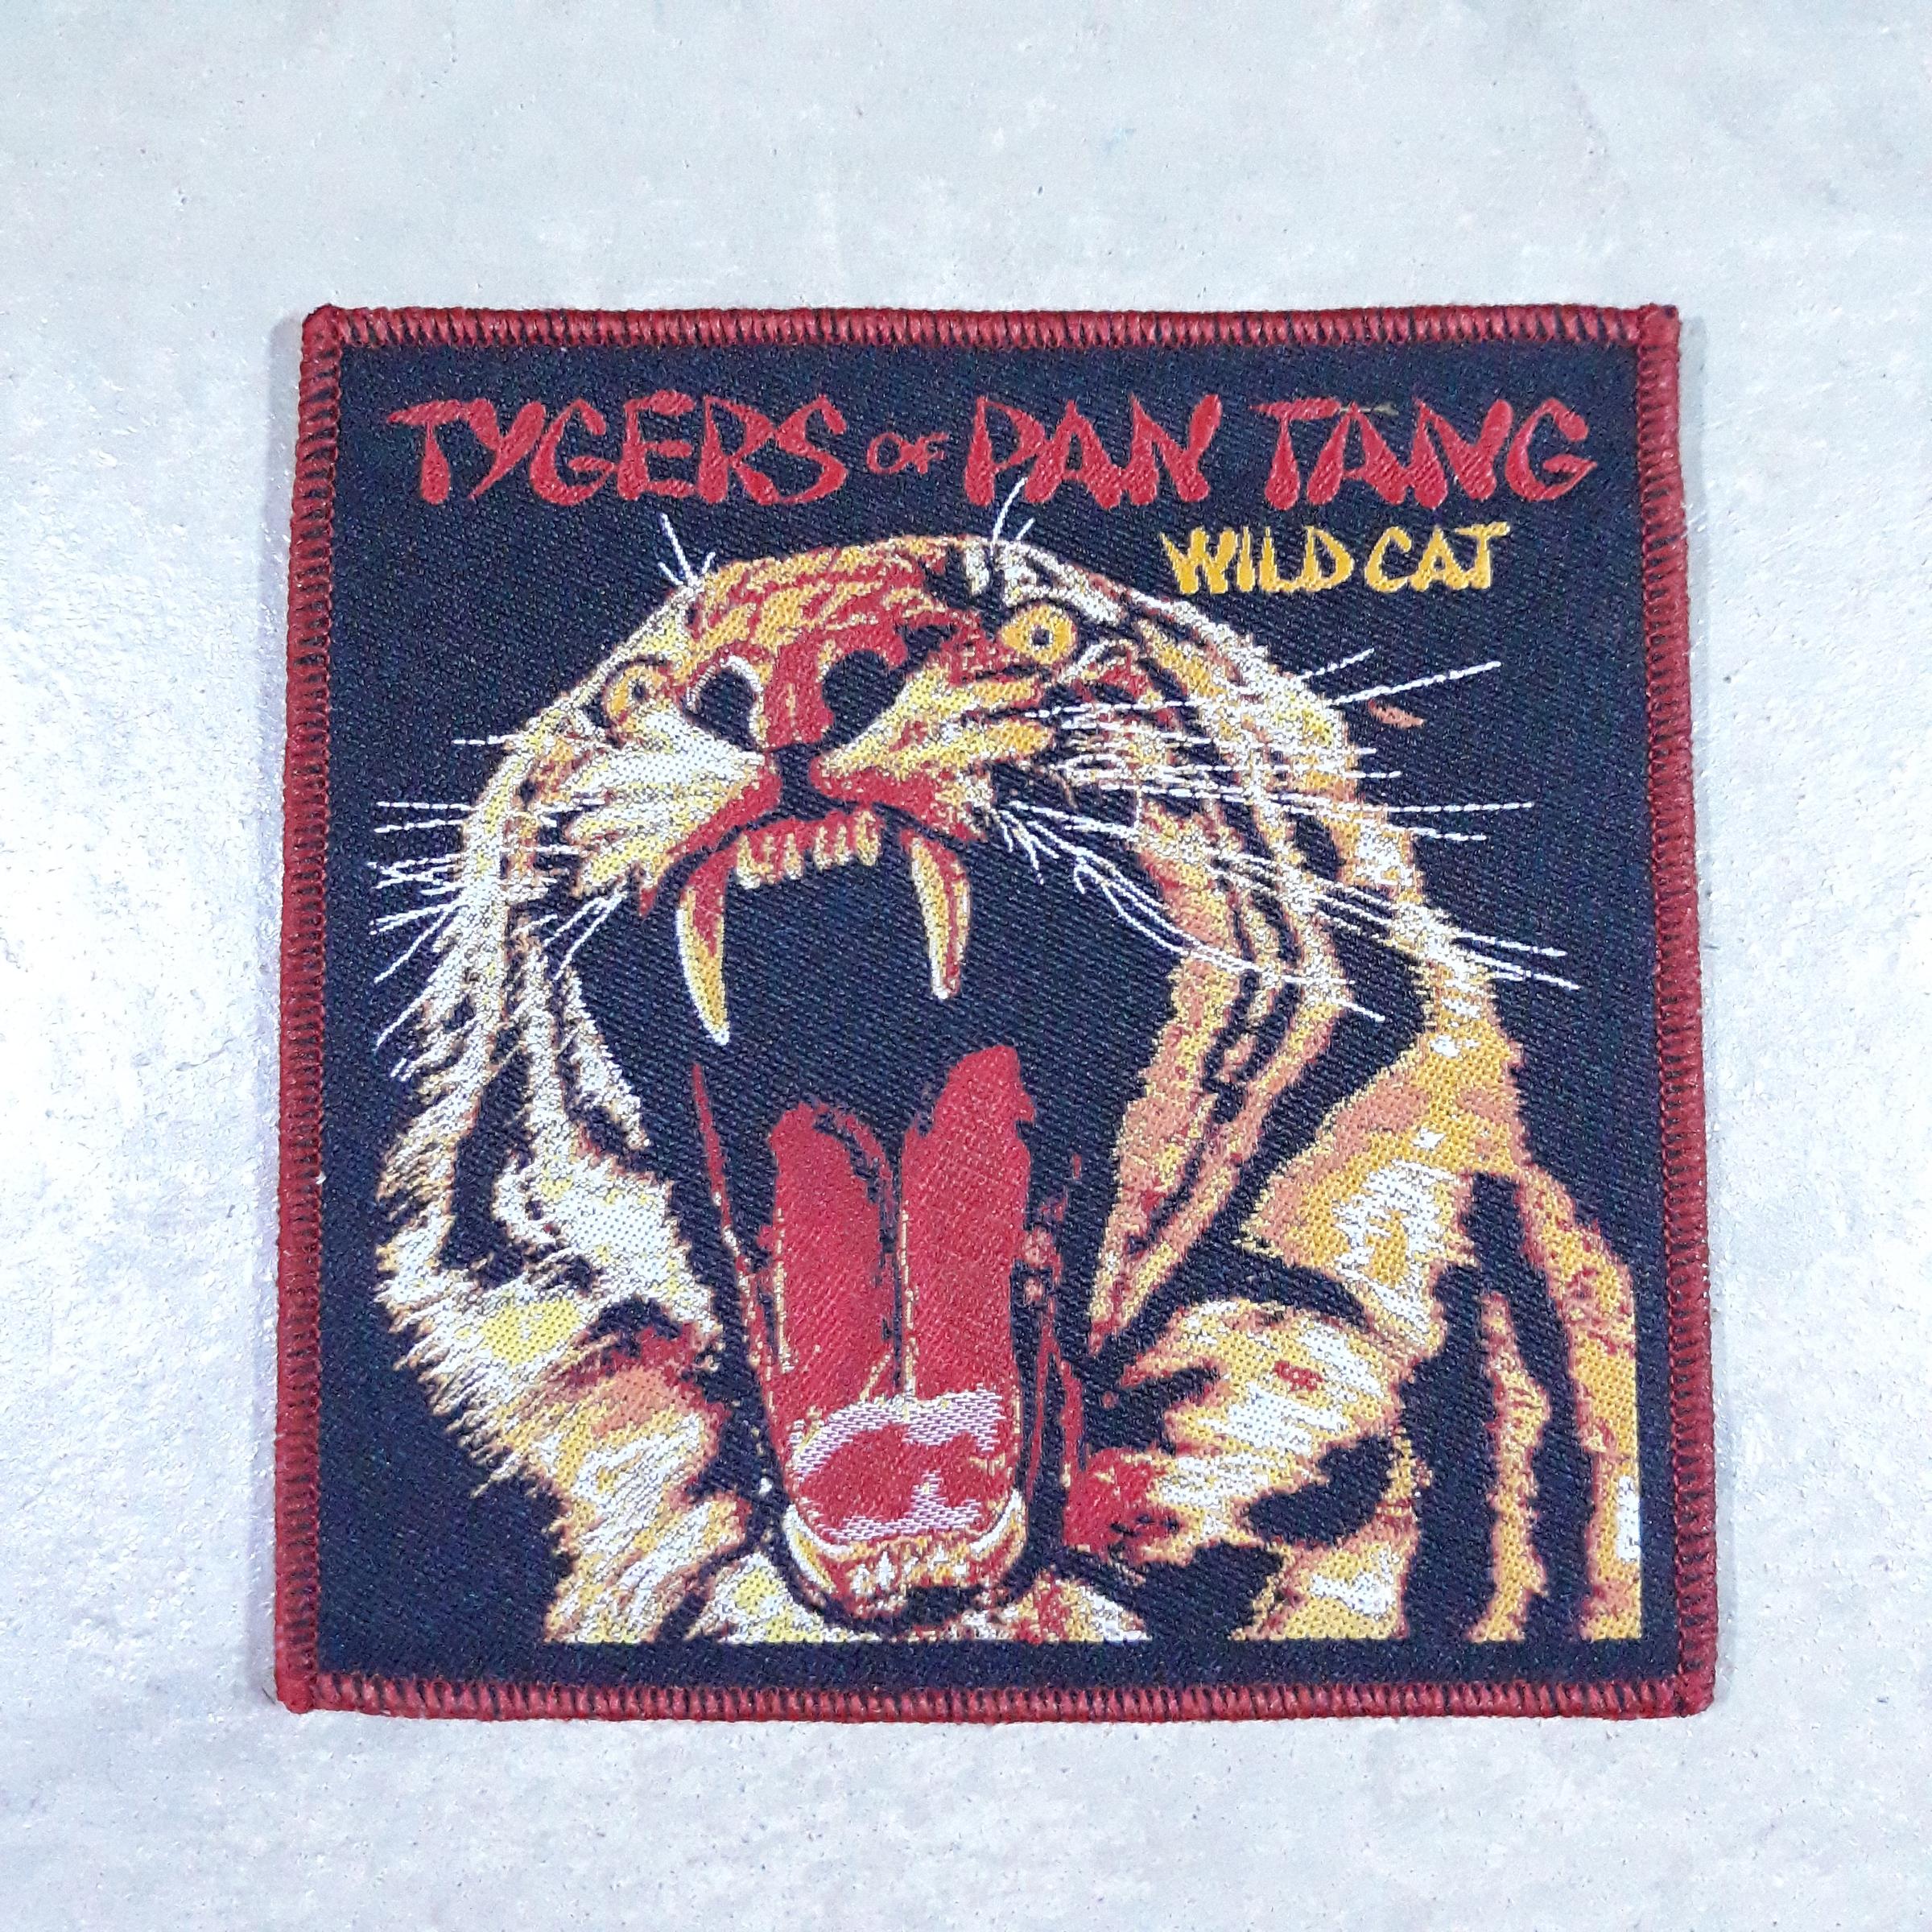 Tygers of Pan Tang-wild cat woven patch.jpg